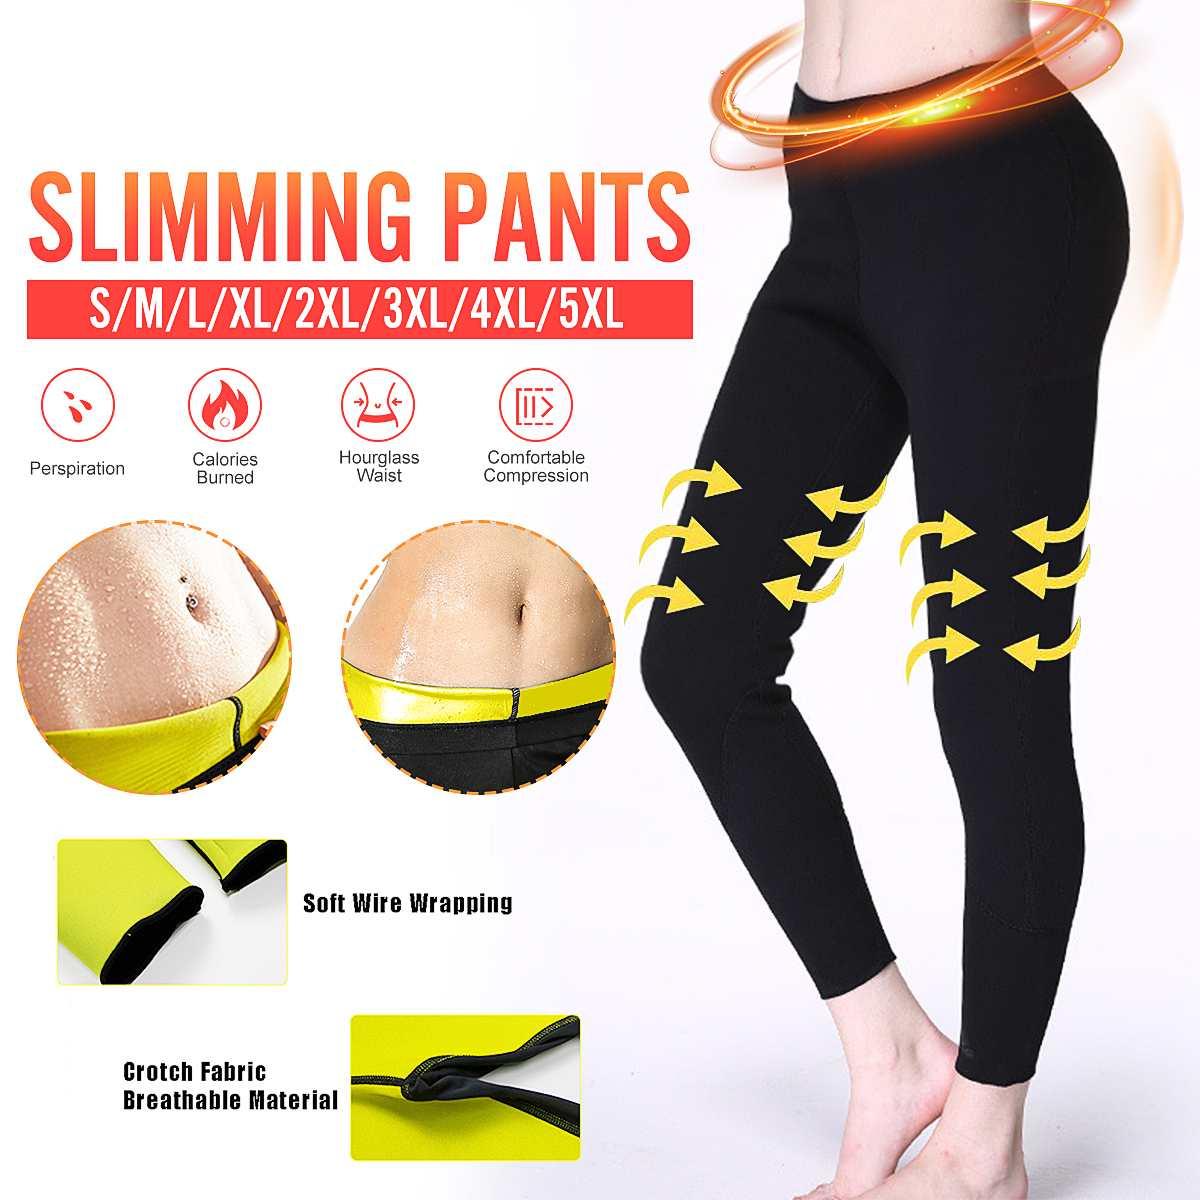 Women's Hot Sauna Pants Neoprene Sauna Slimming Pants Gym Workout Hot Thermo Sweat Leggings Shapers